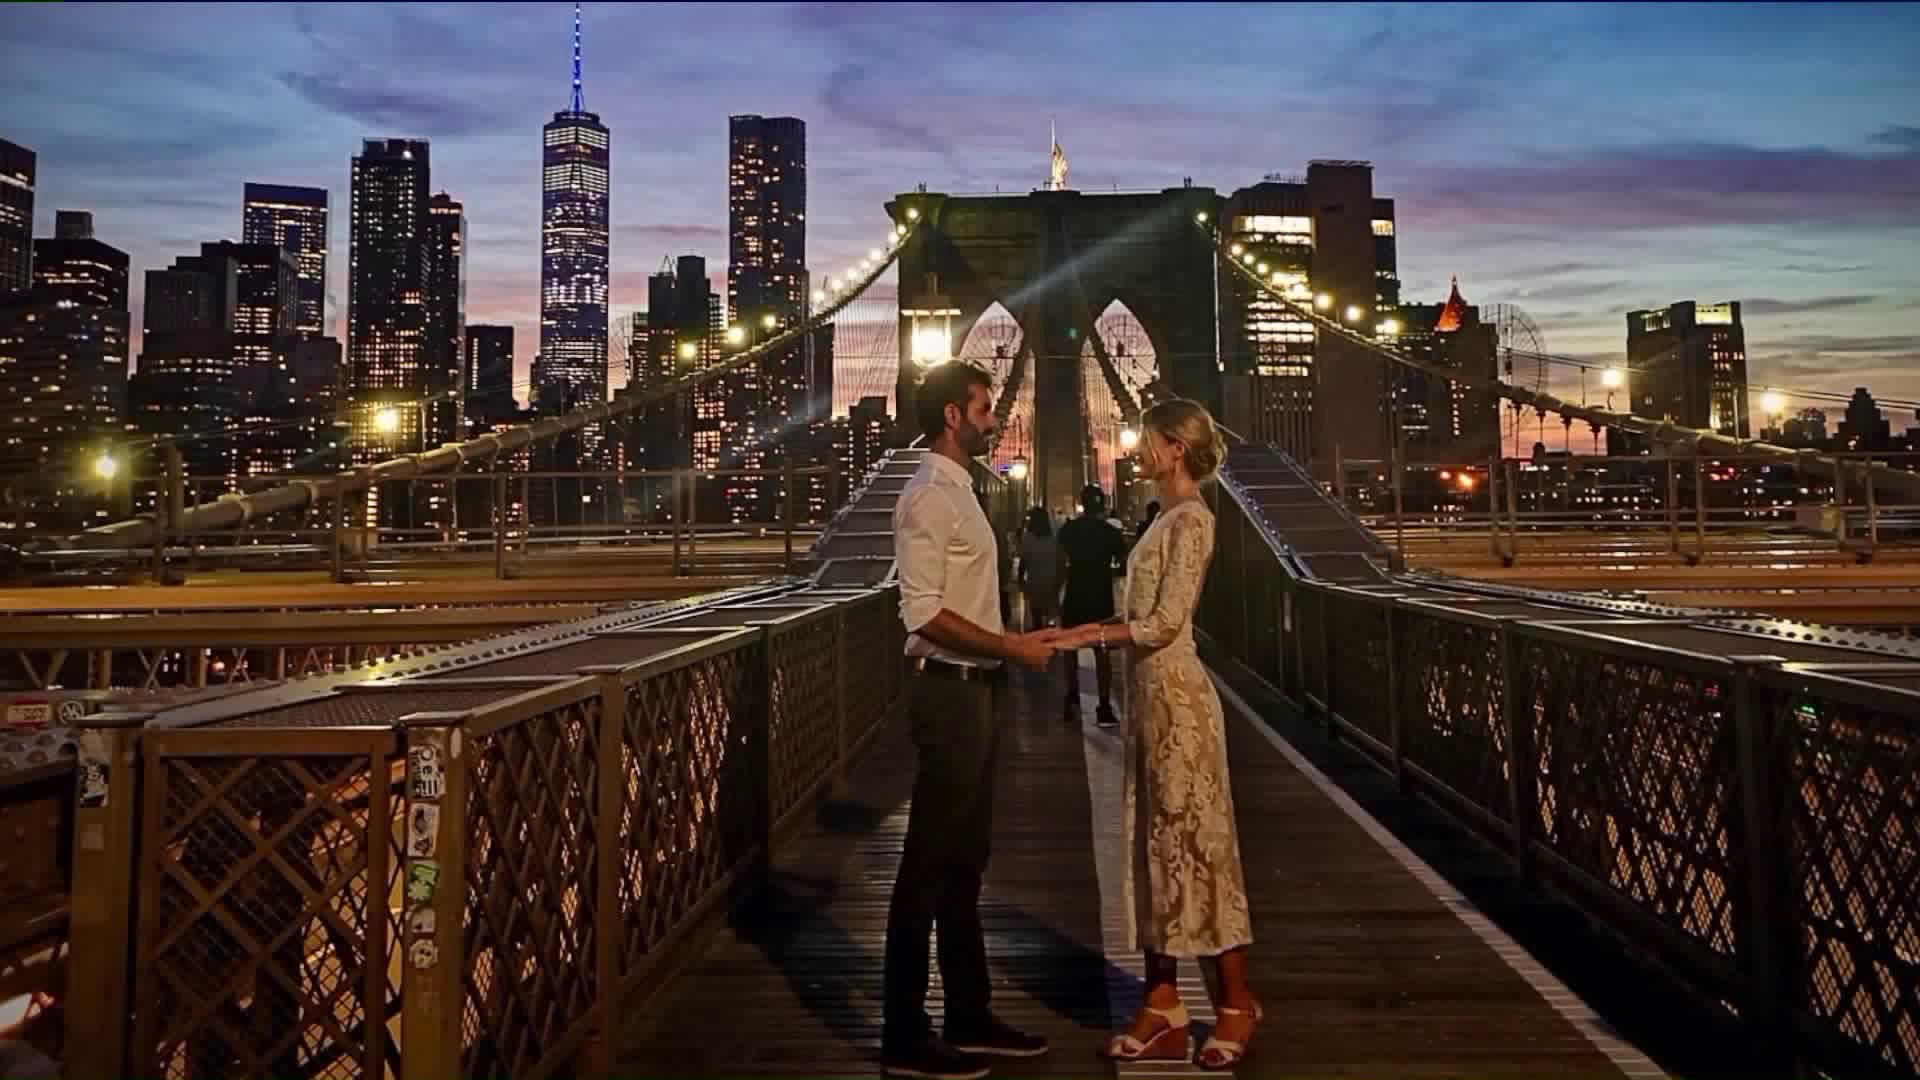 Biker Captures Photos Of Couple Getting Married On Brooklyn Bridge